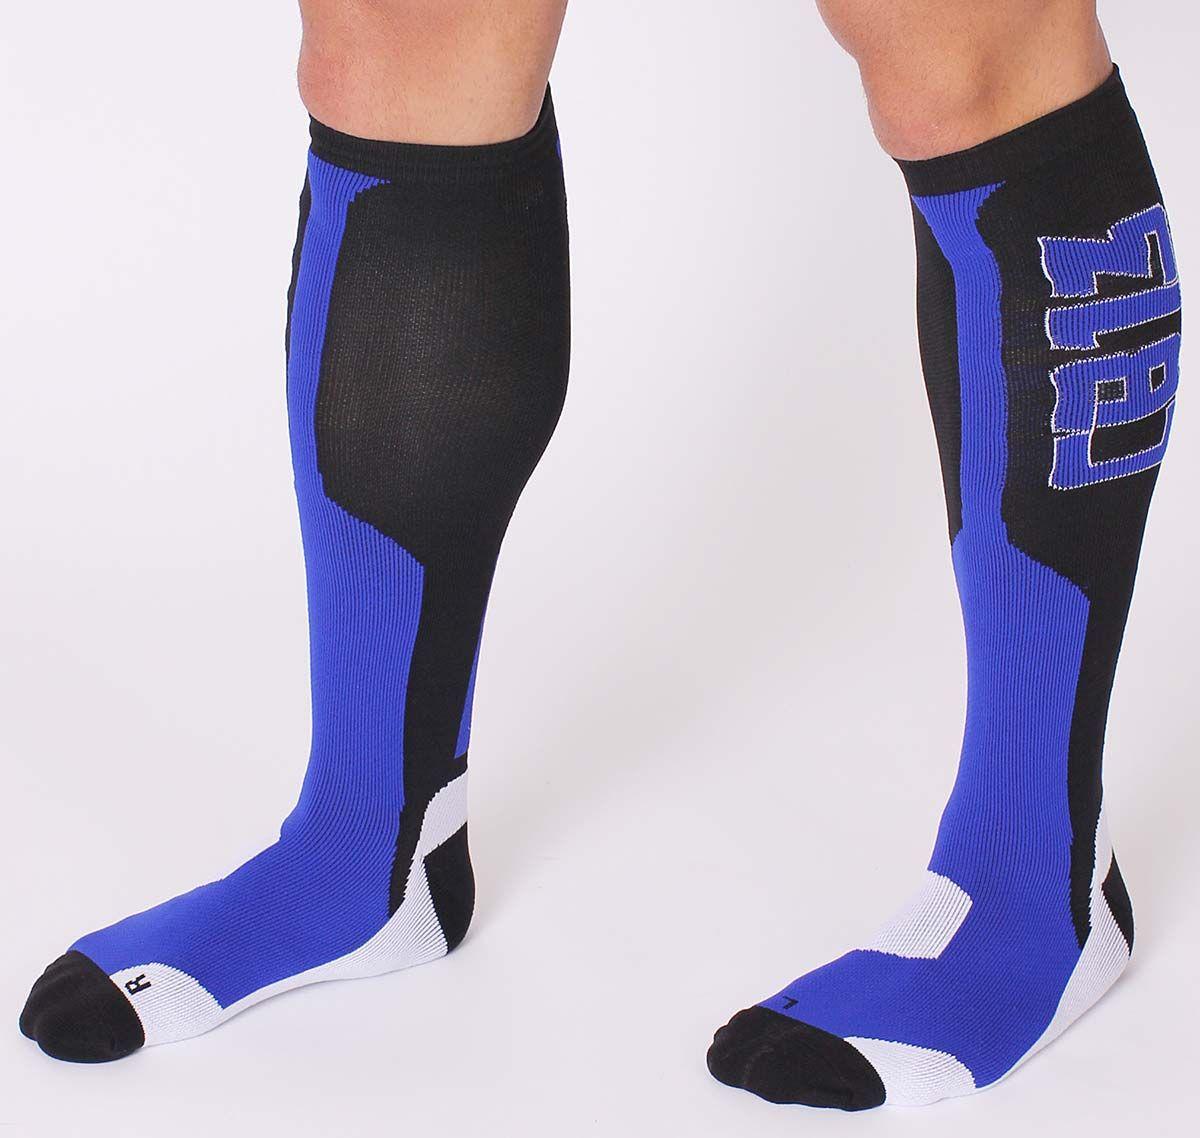 Cellblock 13 Calcetines deportivos ARSENAL KNEE HIGH SOCK, azul